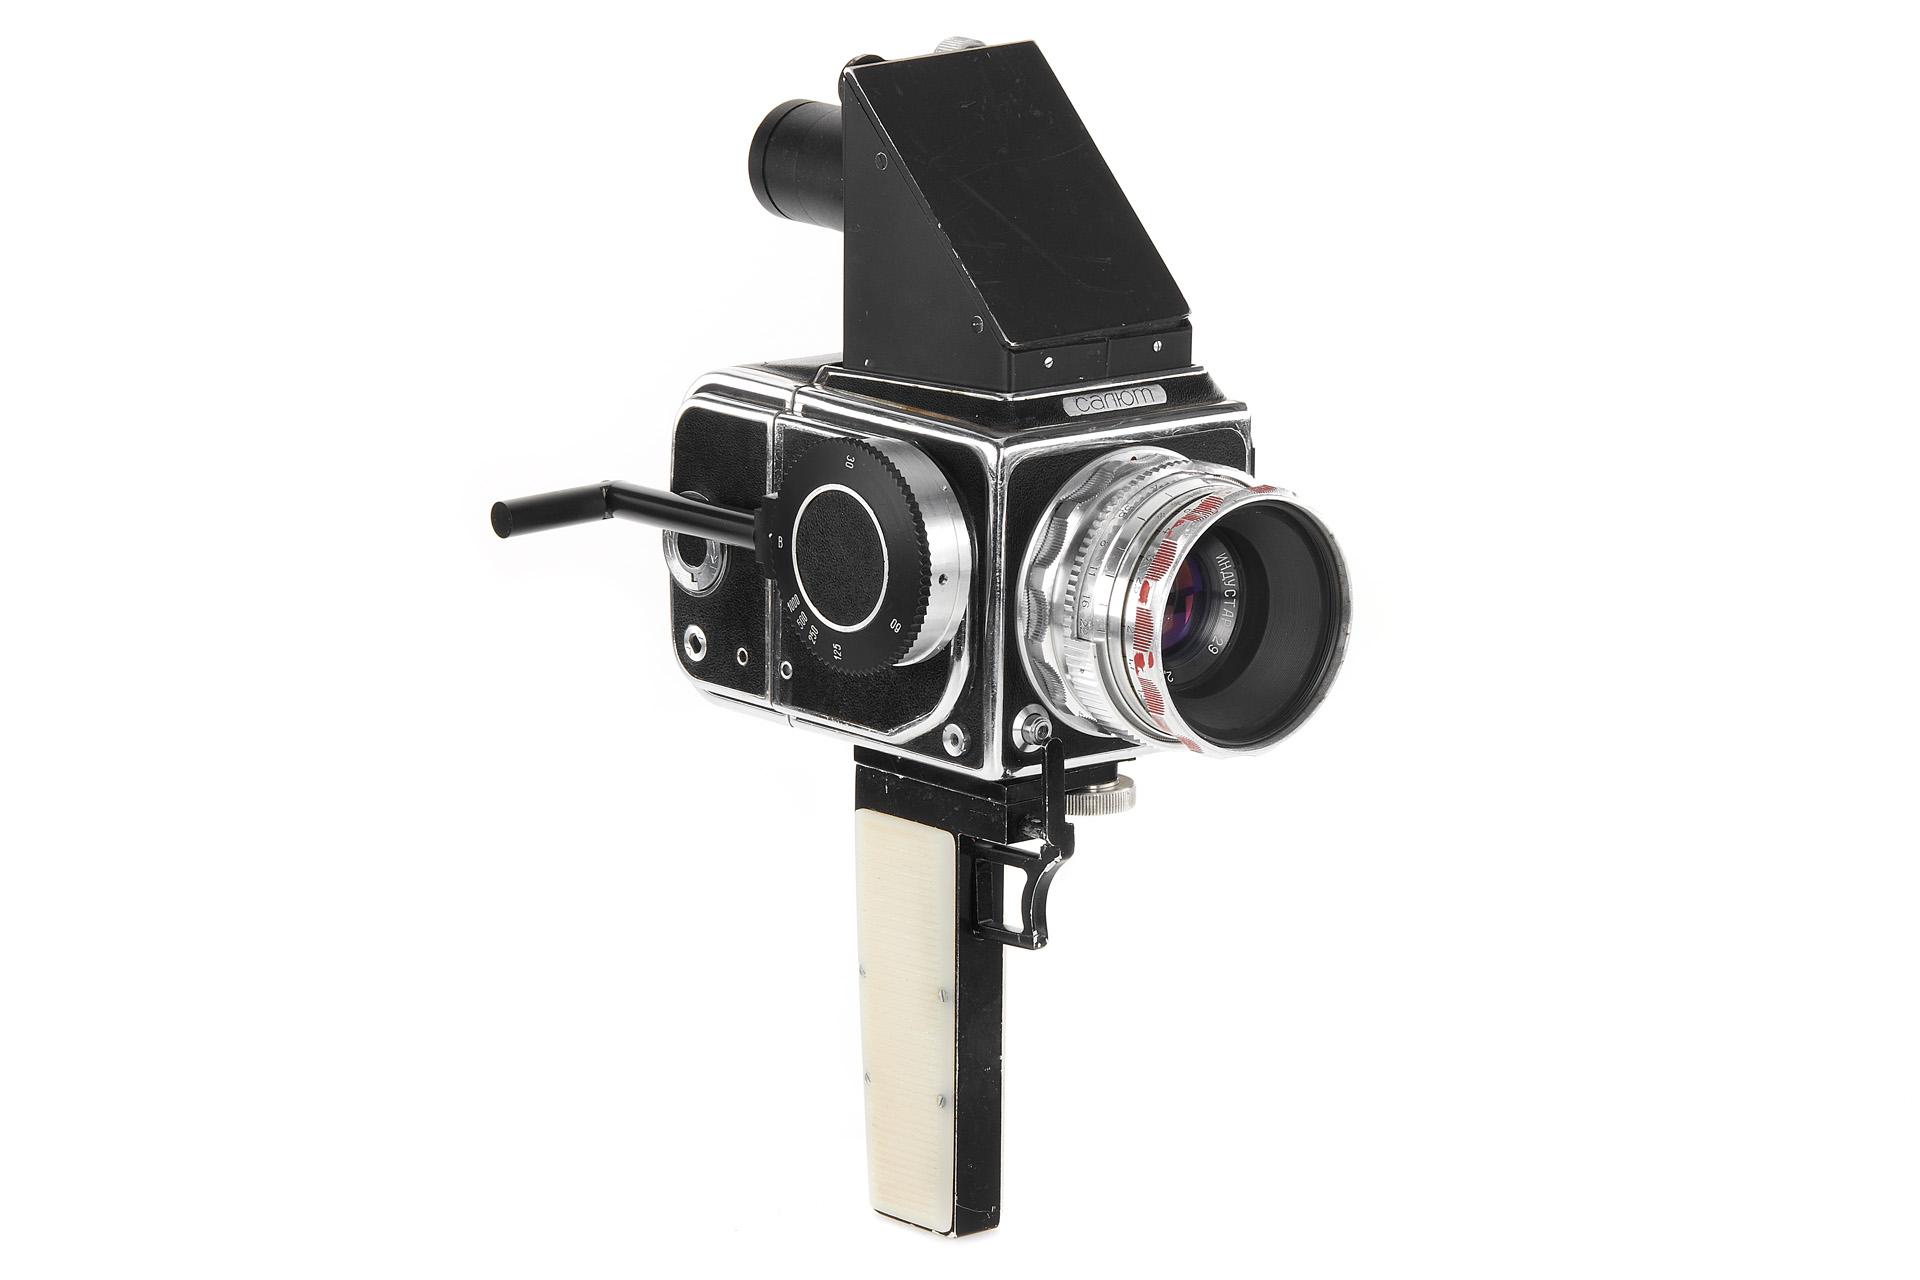 Salyut 1W camera (Pic: Leitz Photographica)